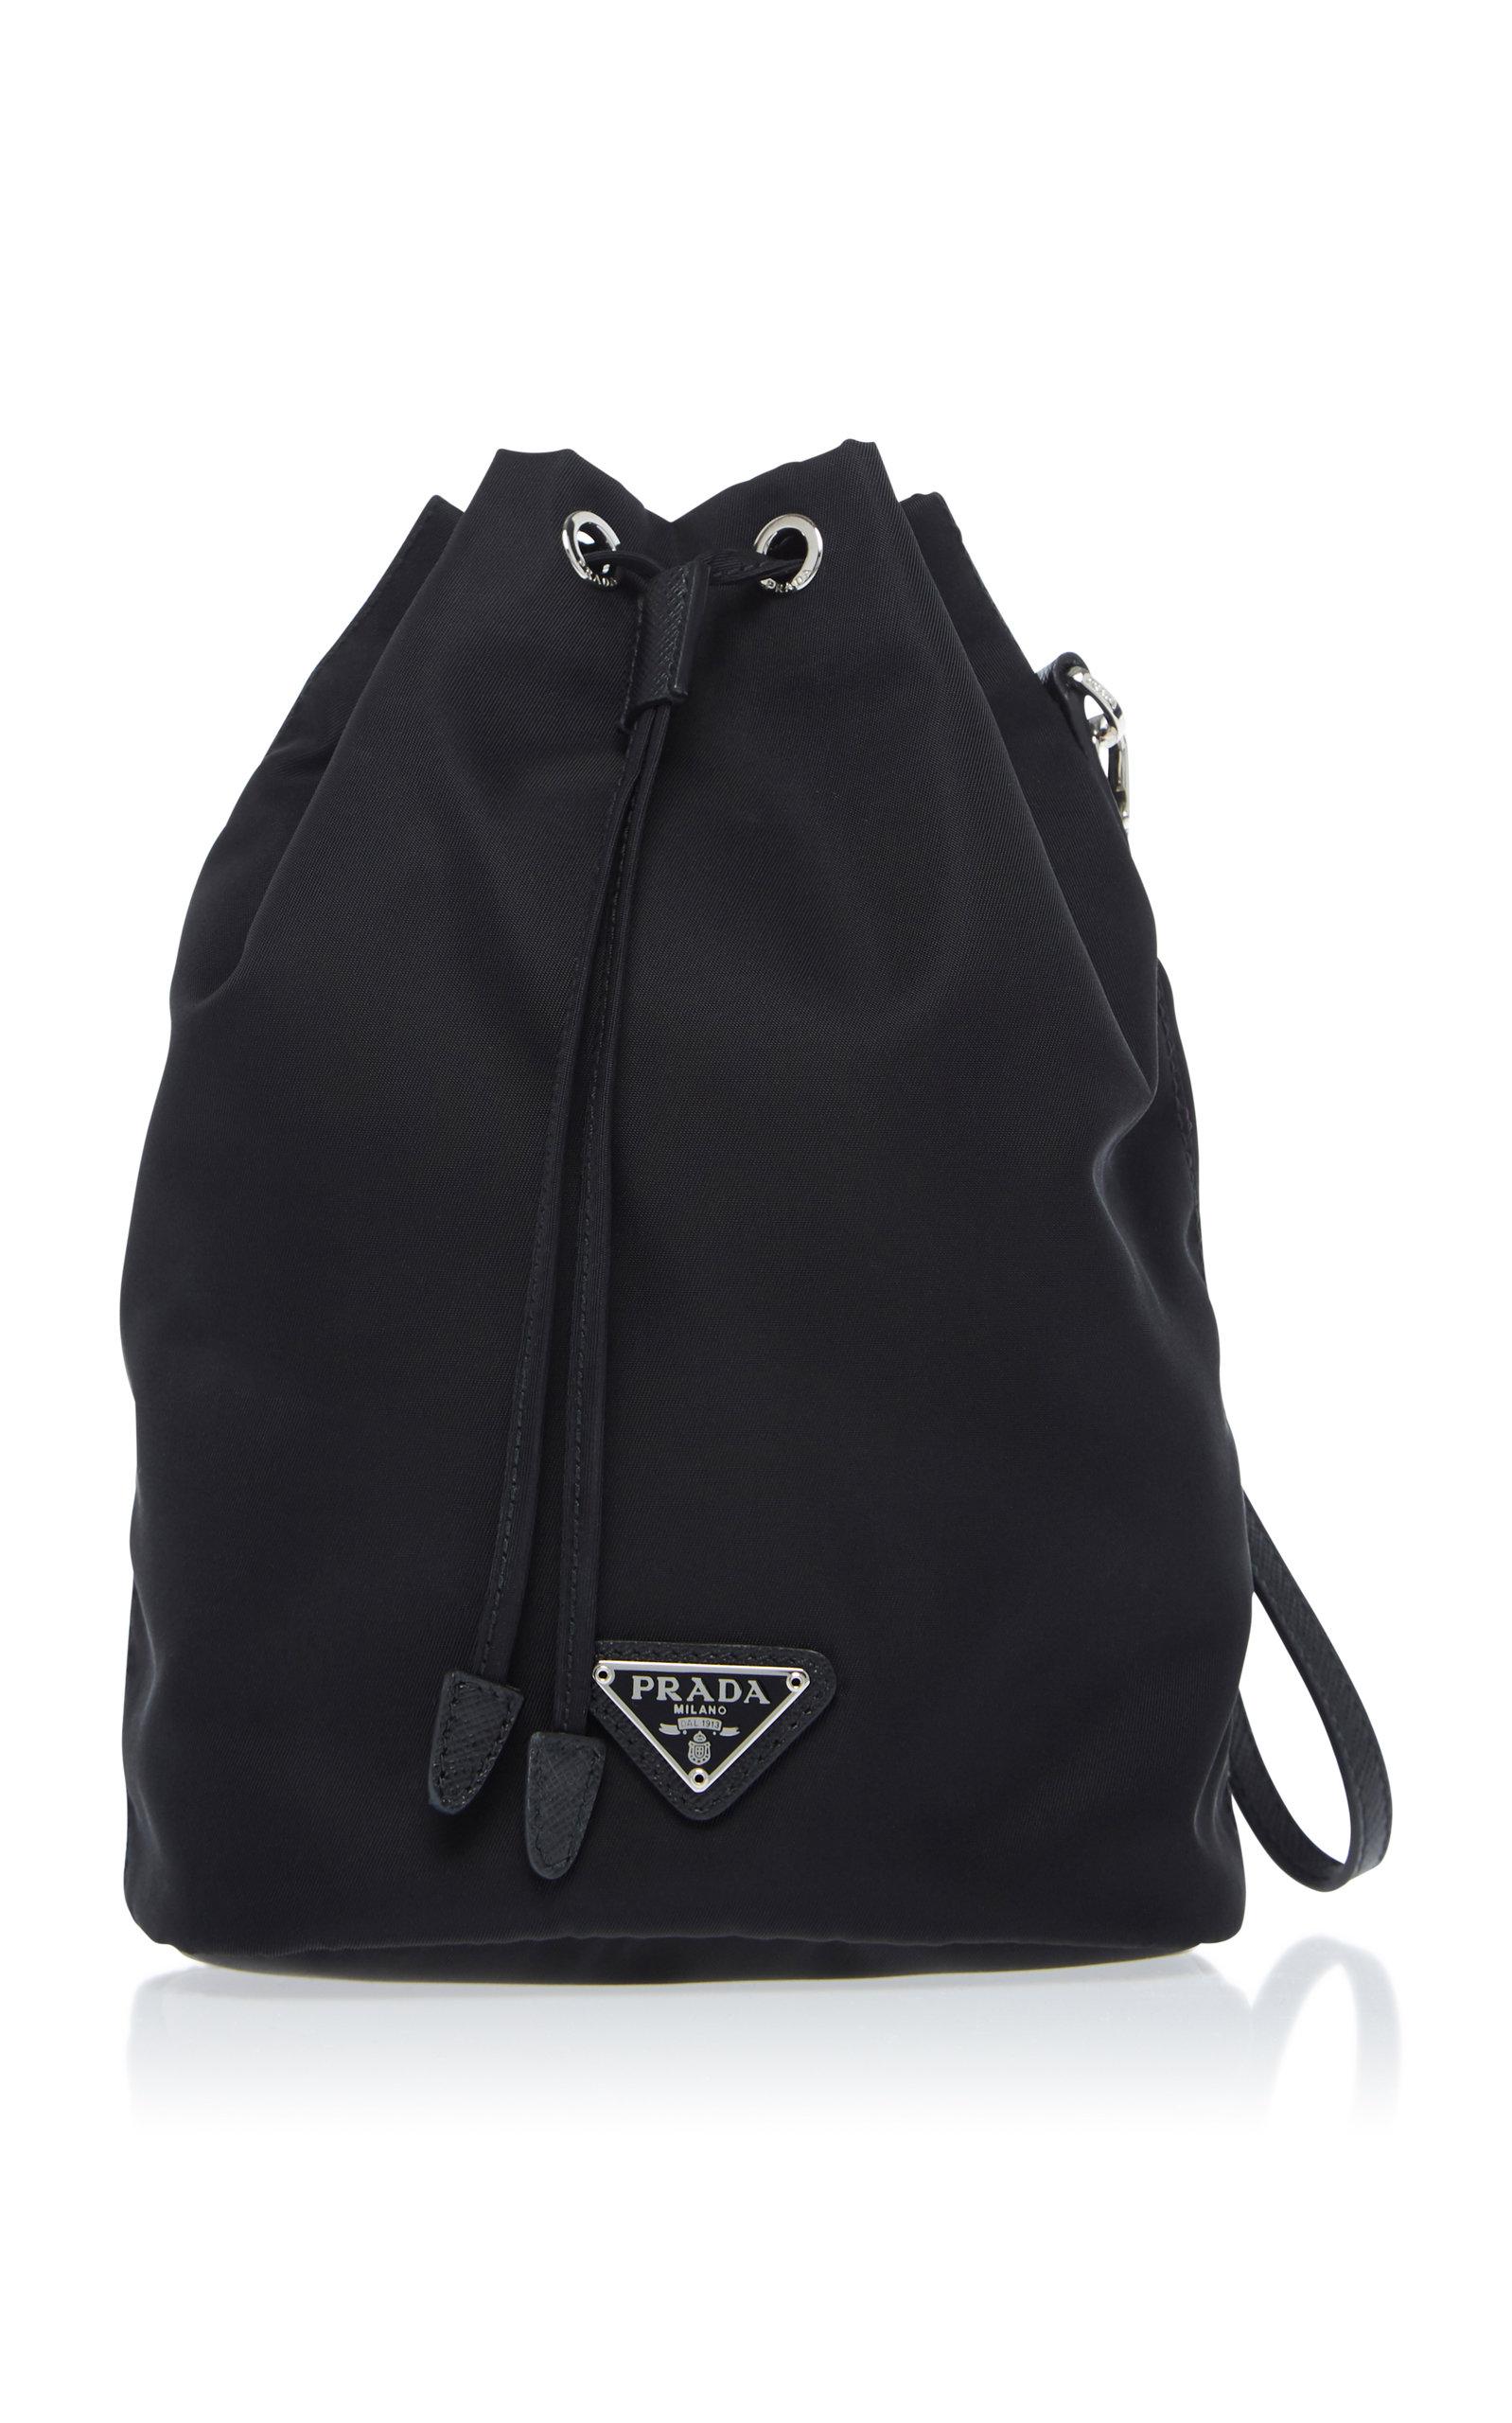 5456a9ca7 Prada Nylon Drawstring Backpack- Fenix Toulouse Handball